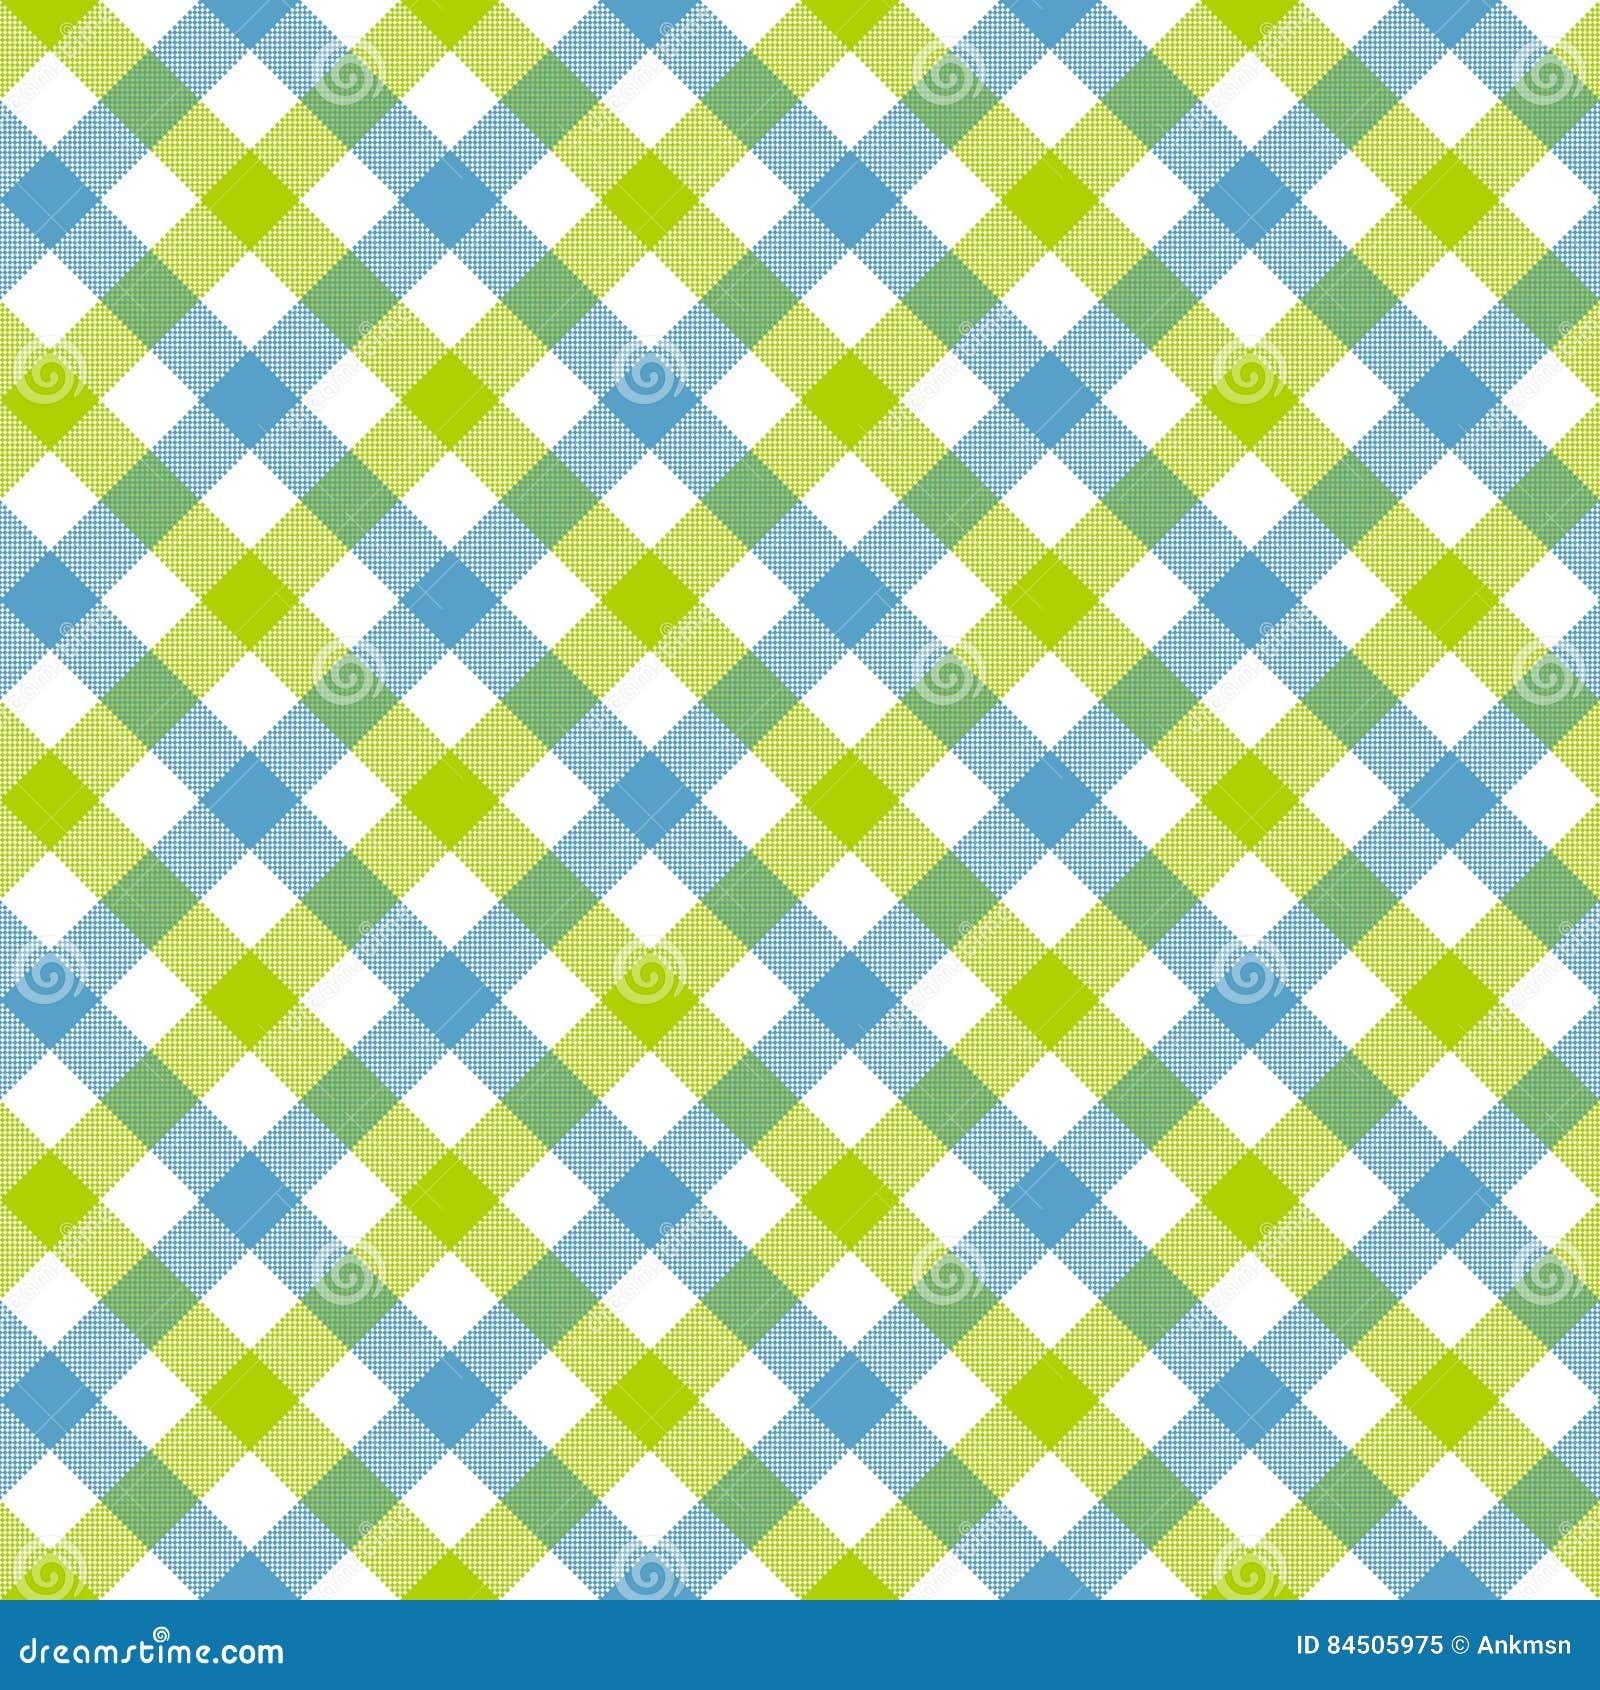 White Green Blue Check Plaid Fabric Texture Seamless Pattern